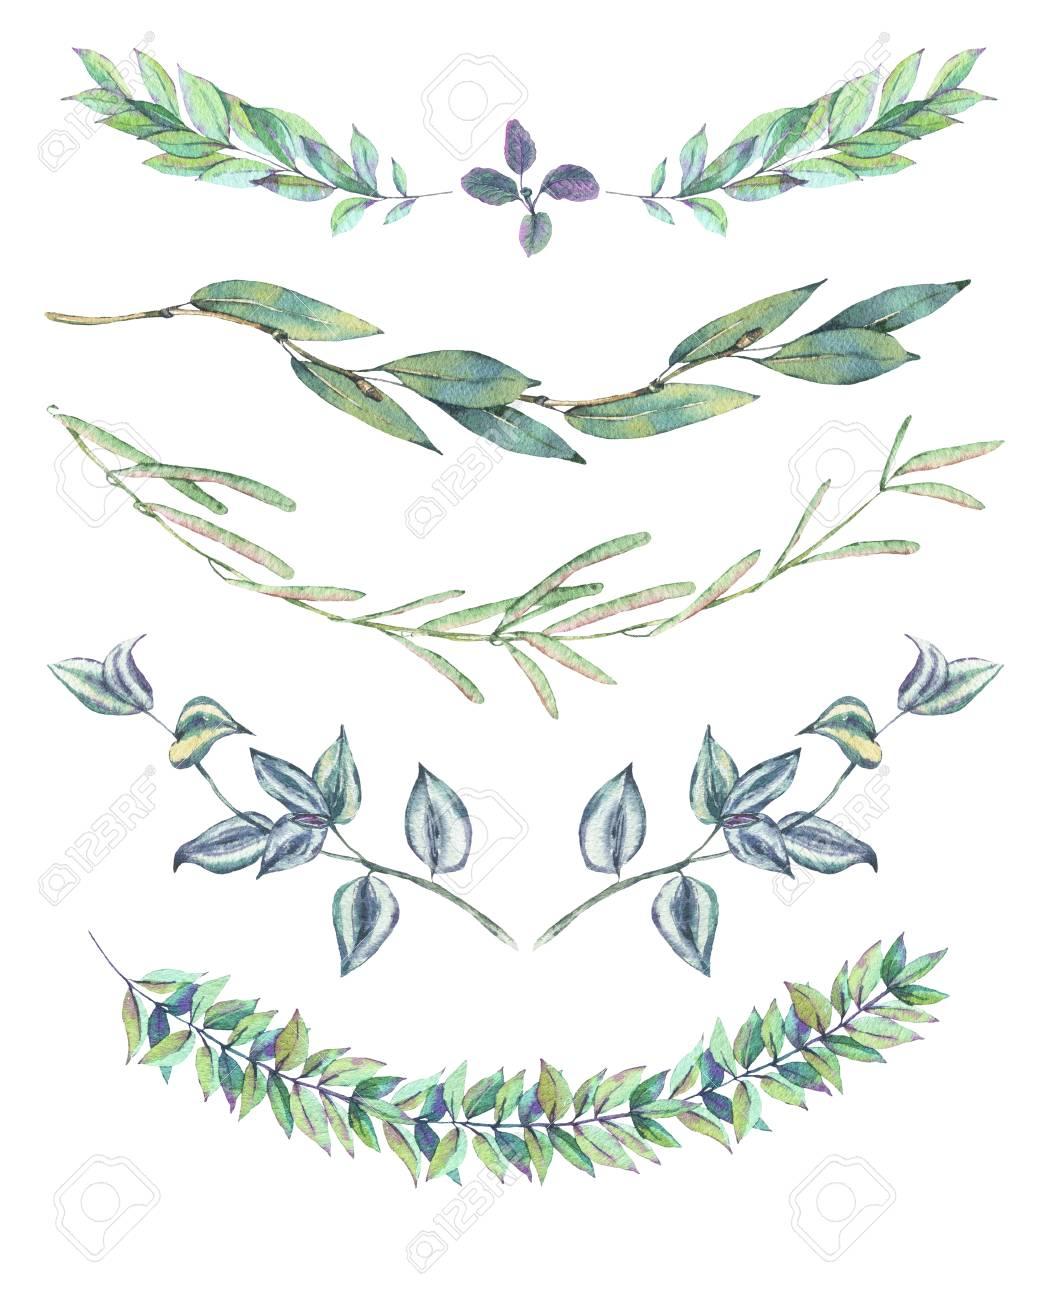 set leaf wreath watercolor vintage natural wreath or garland